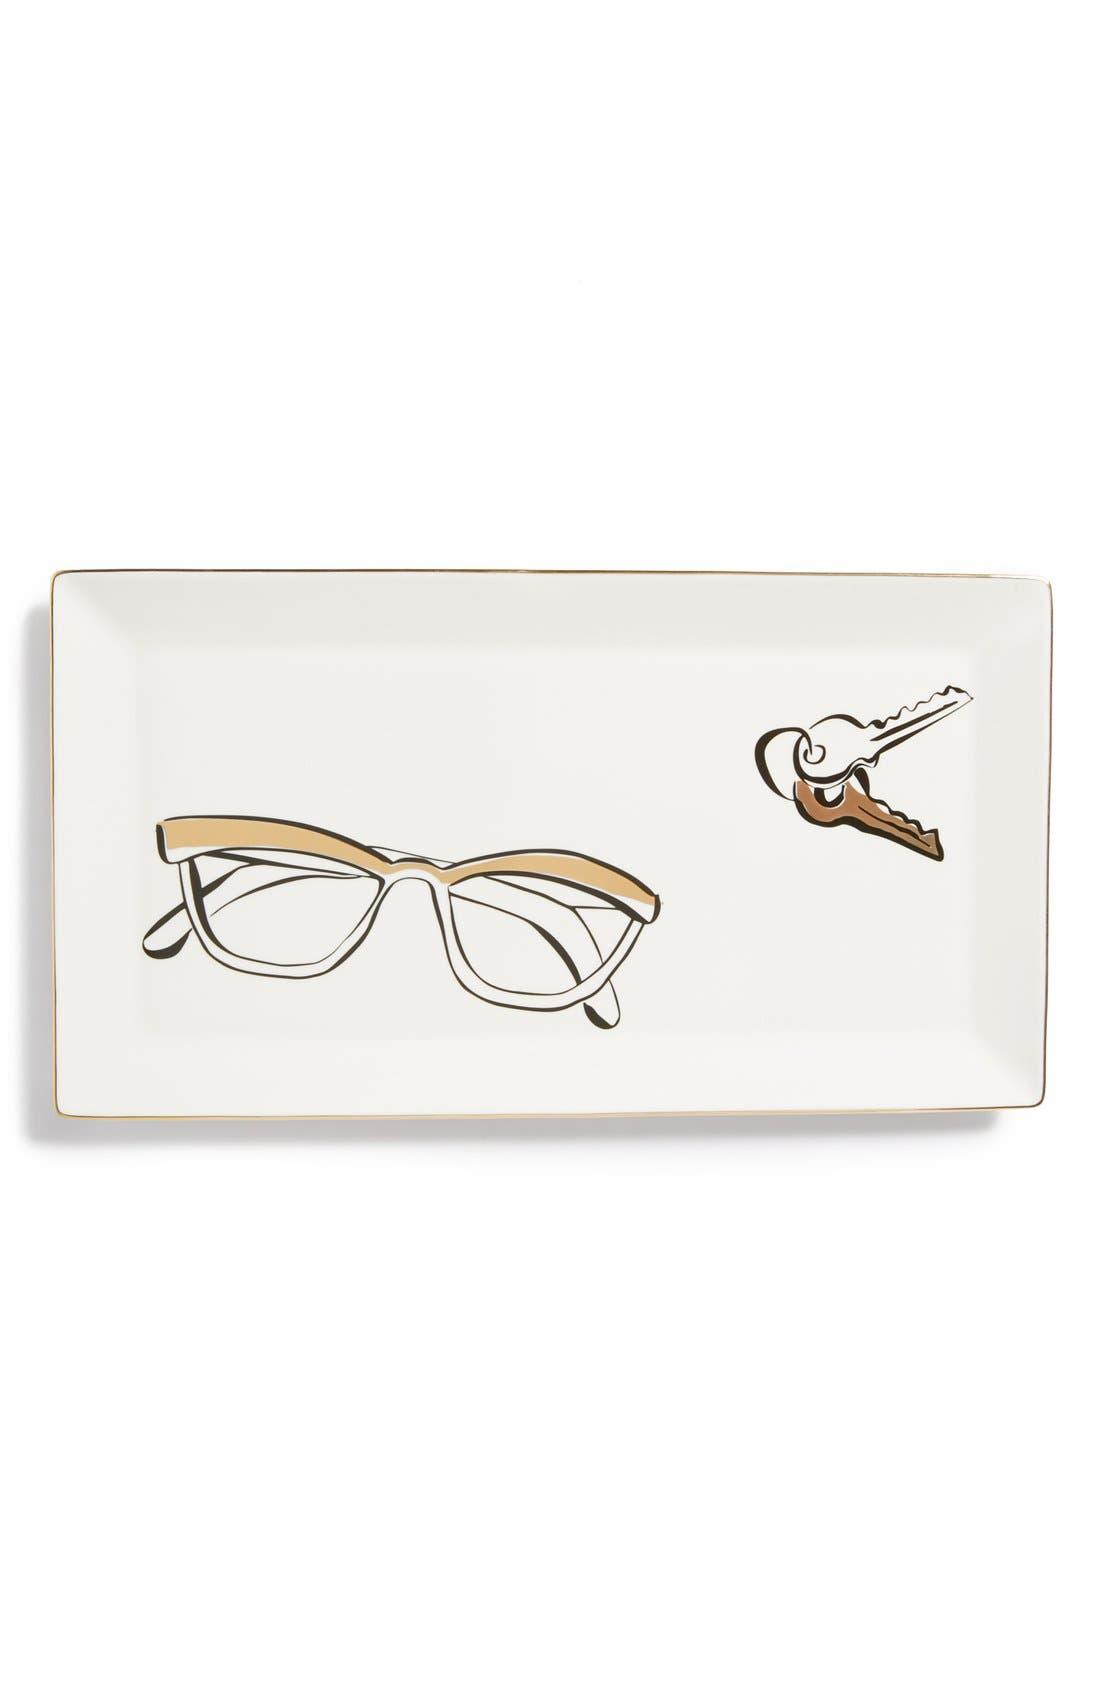 KATE SPADE NEW YORK,                             'eyeglasses' trinket tray,                             Main thumbnail 1, color,                             100